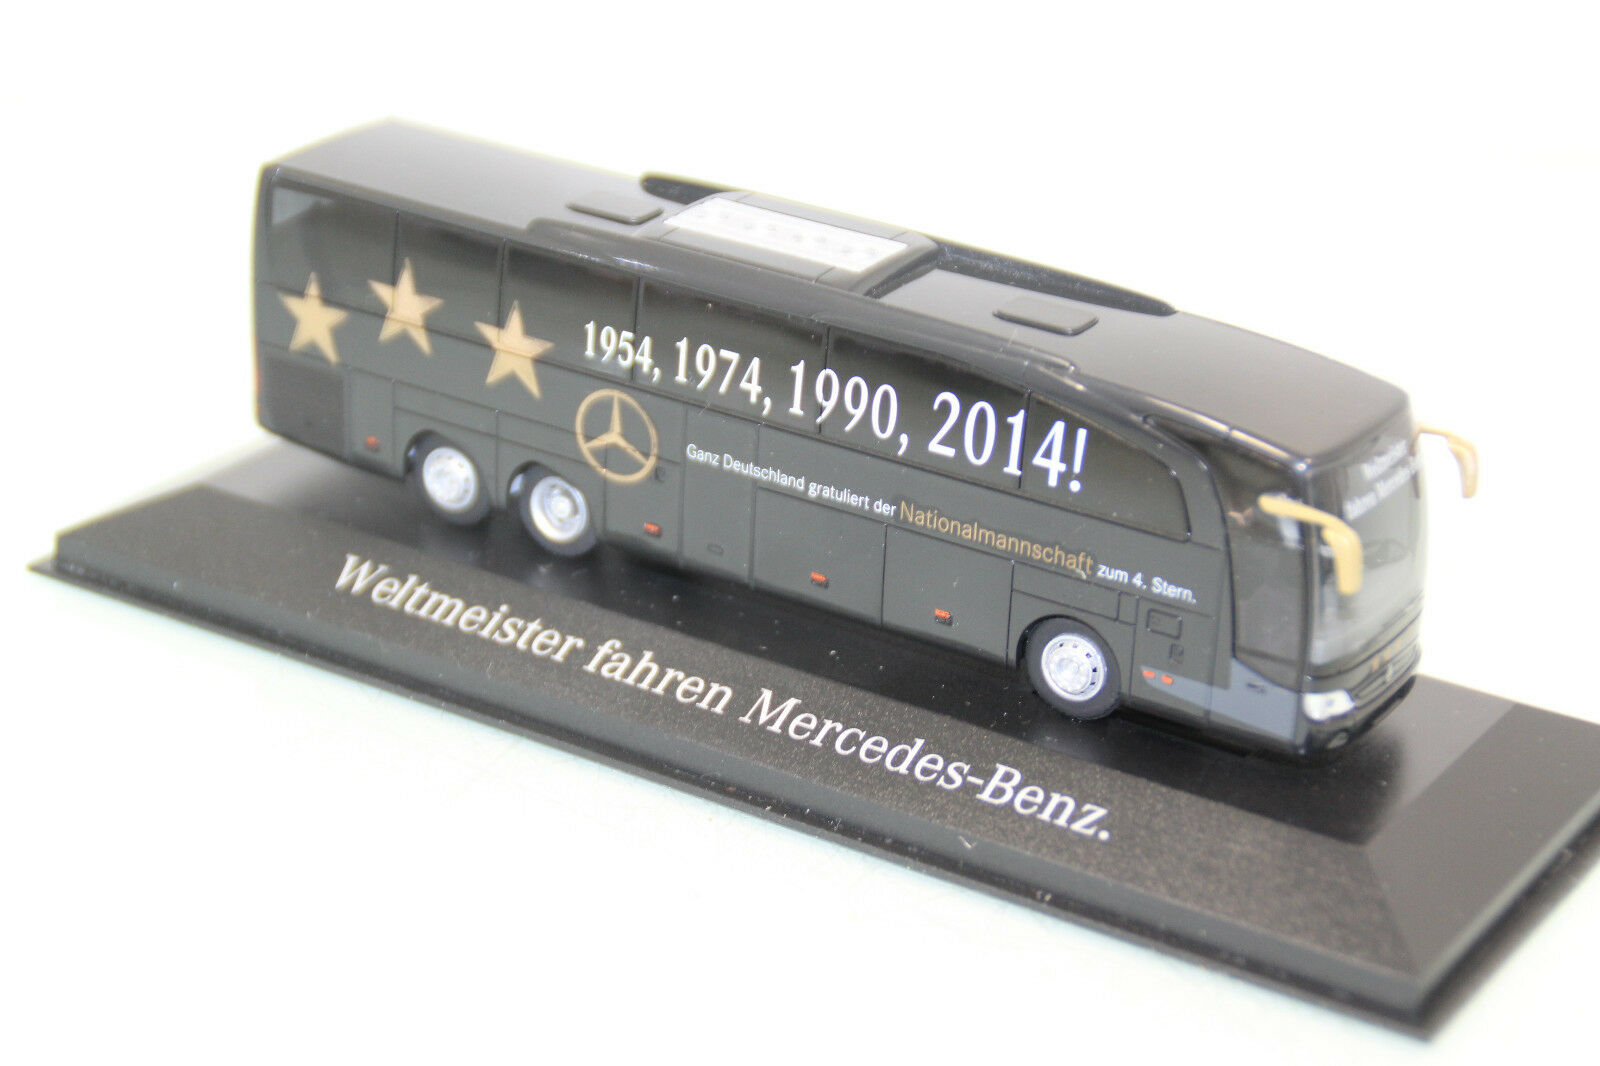 Rietze 1 87 h0 exclusivement champion du monde-Bus 2014 in neuf dans sa boîte (sl5144)